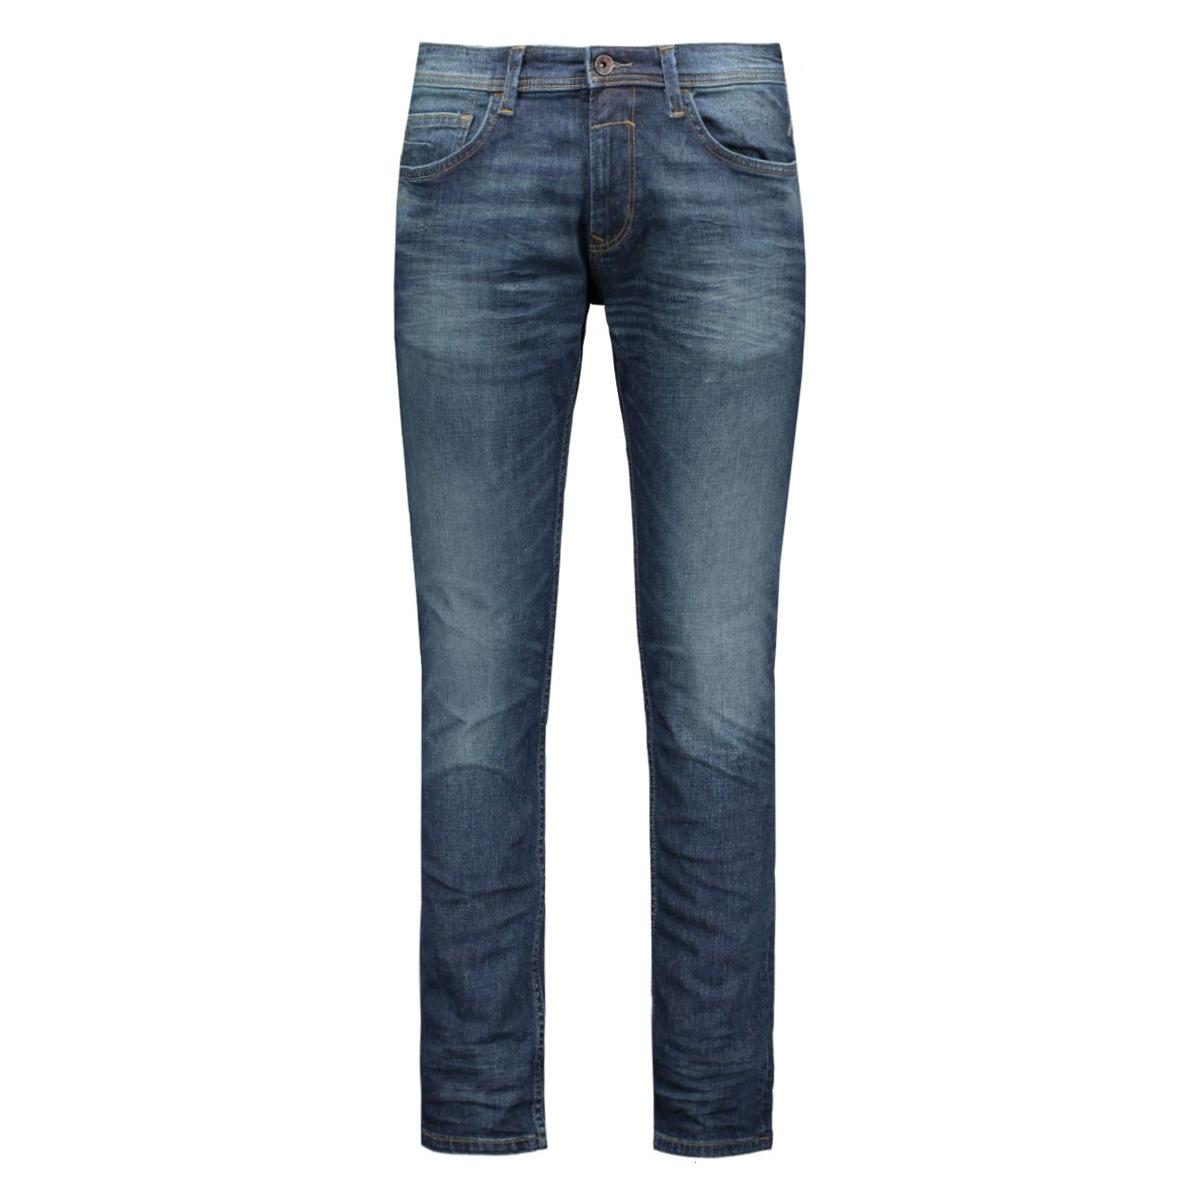 62049680912 tom tailor jeans 1053